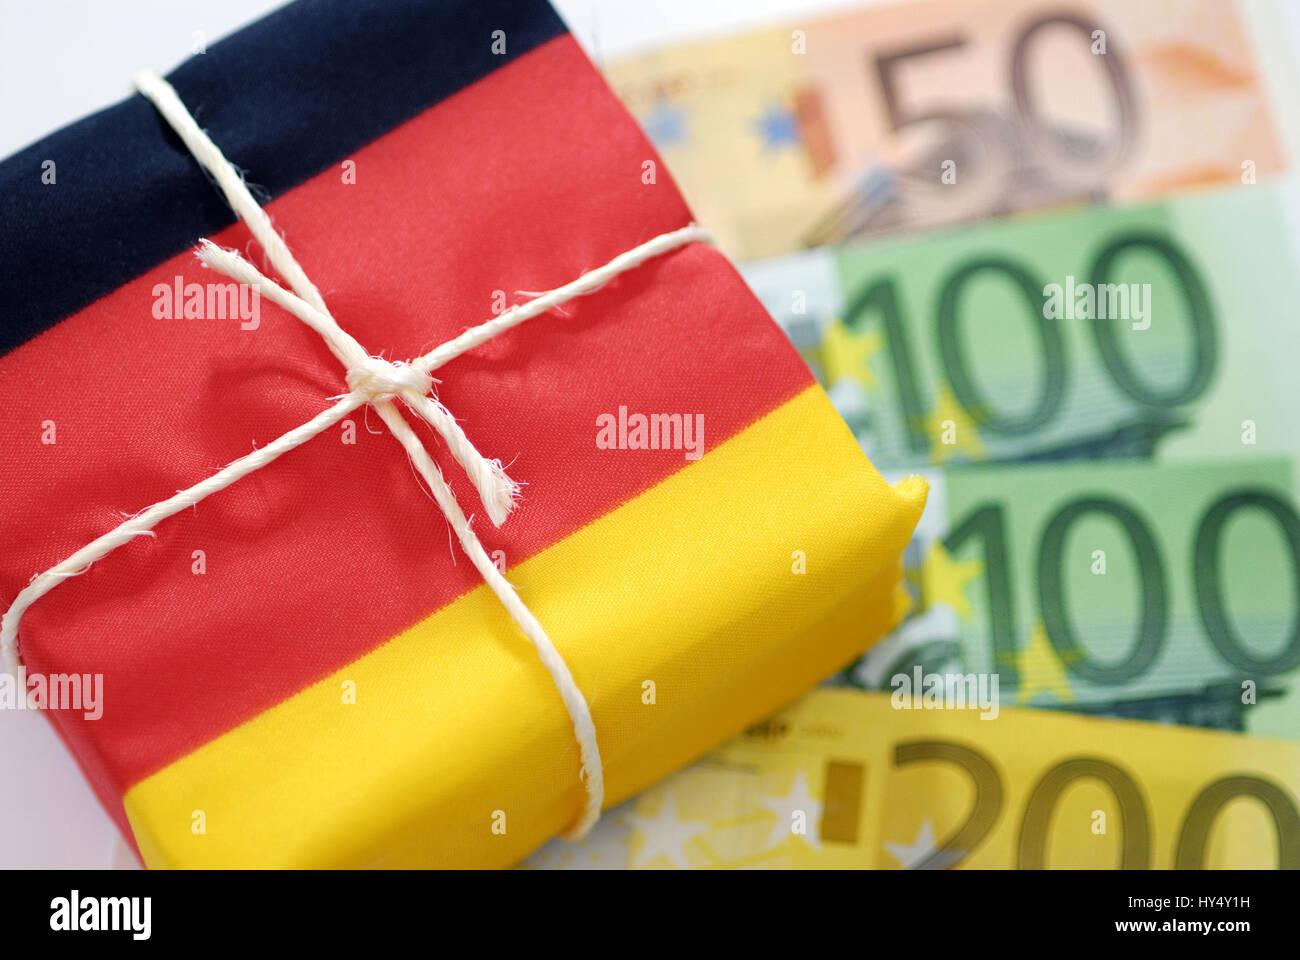 German savings package, Deutsches Sparpaket Stock Photo